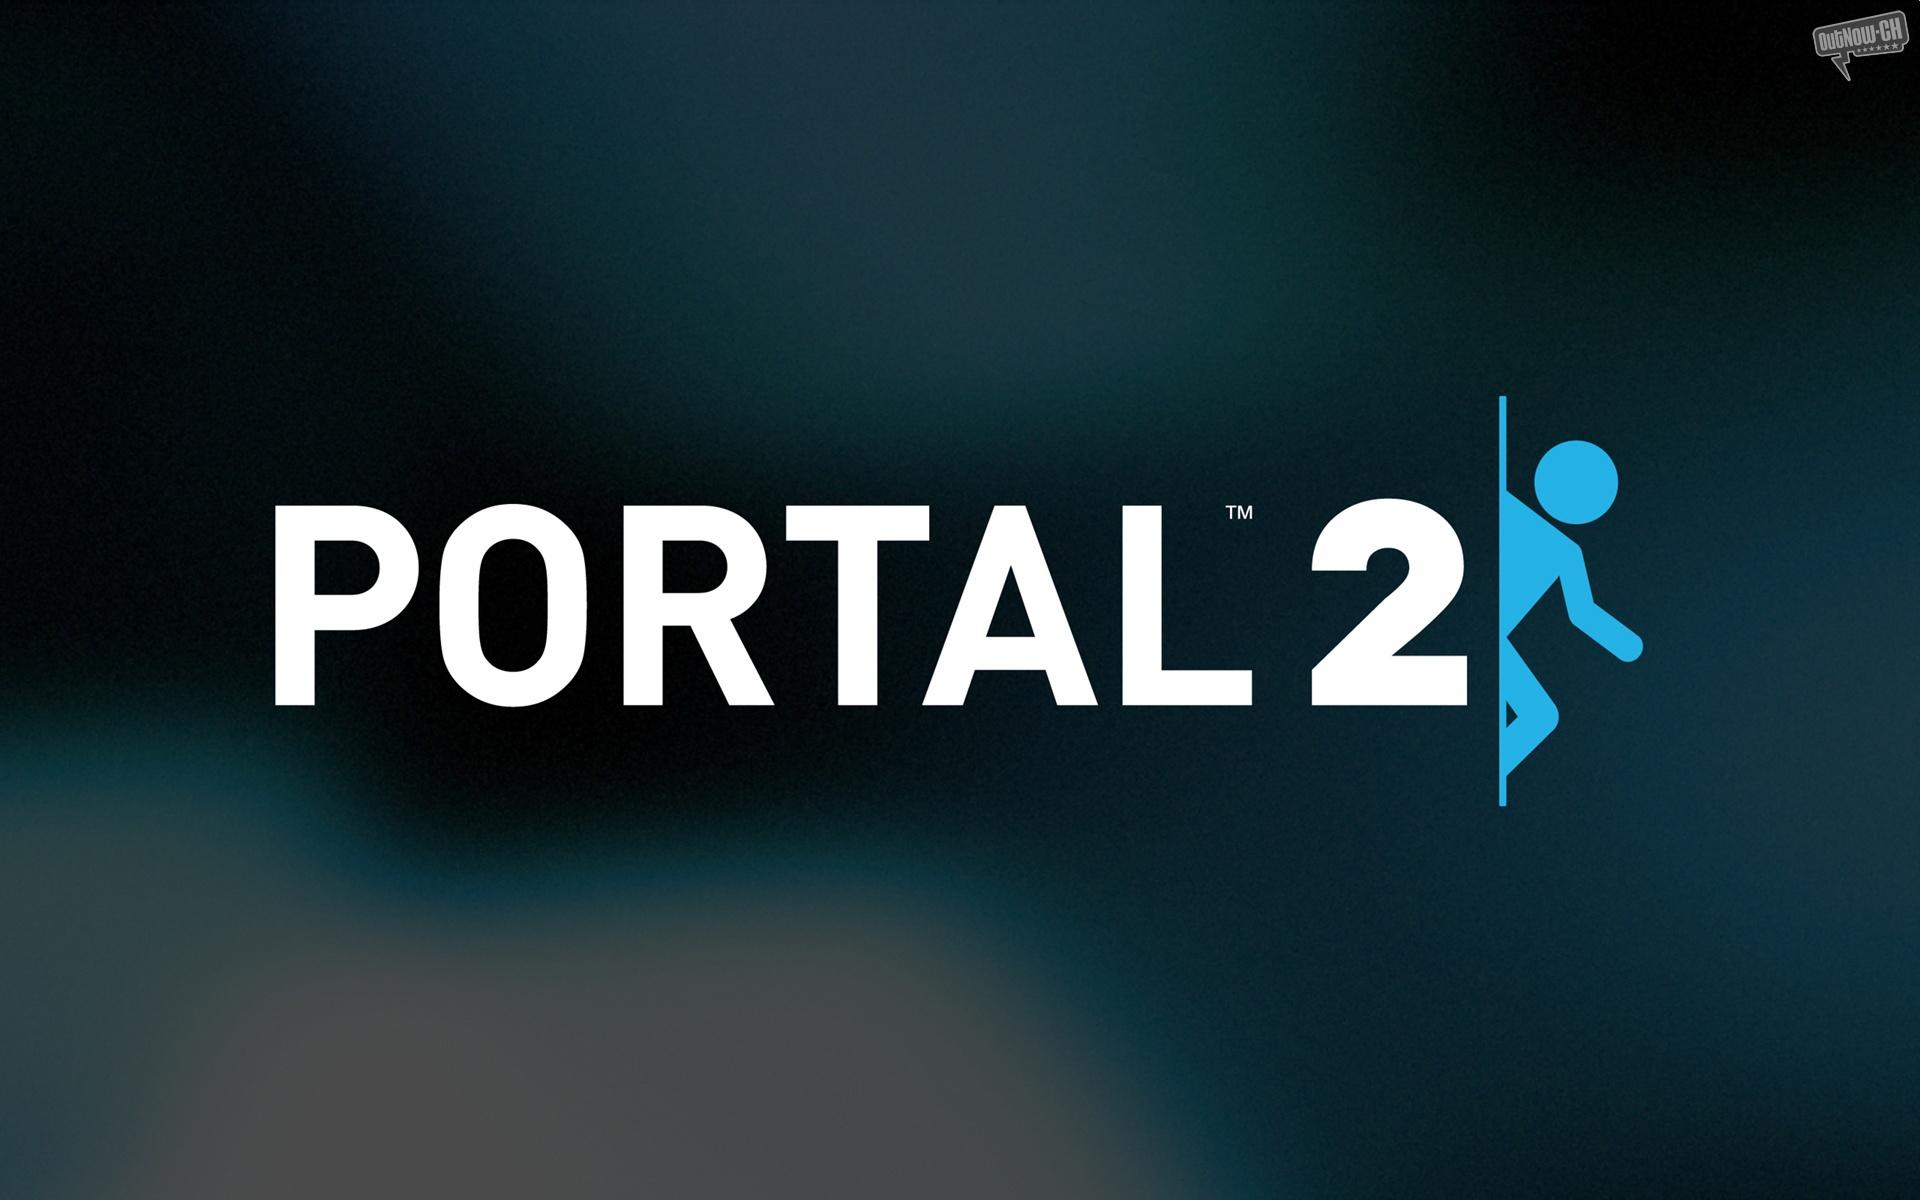 1920x1200 Portal 2 desktop PC and Mac wallpaper 1920x1200